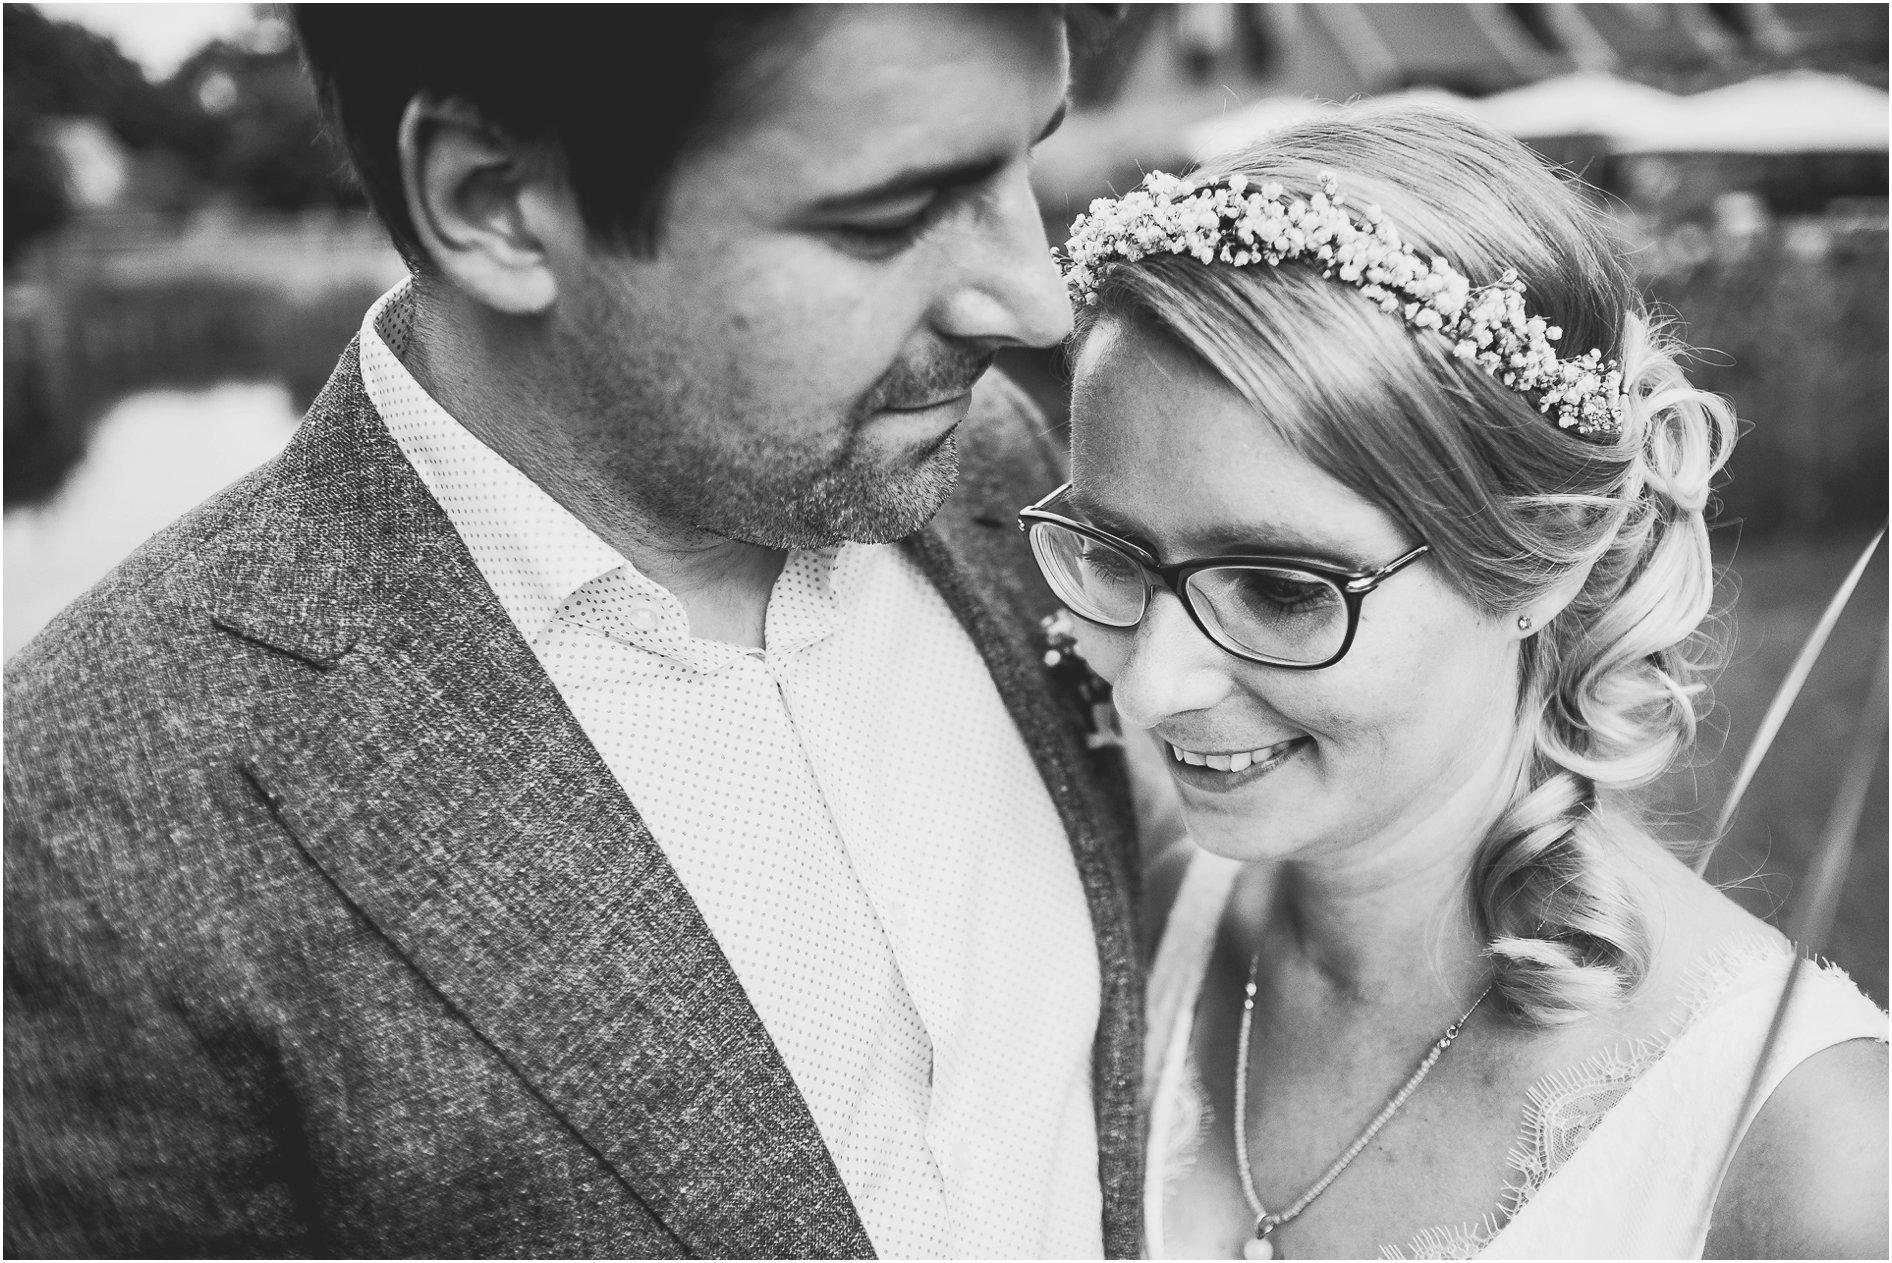 2016-04-19_0054 Sandra & Janis - Hochzeitsfotograf in Seevetal